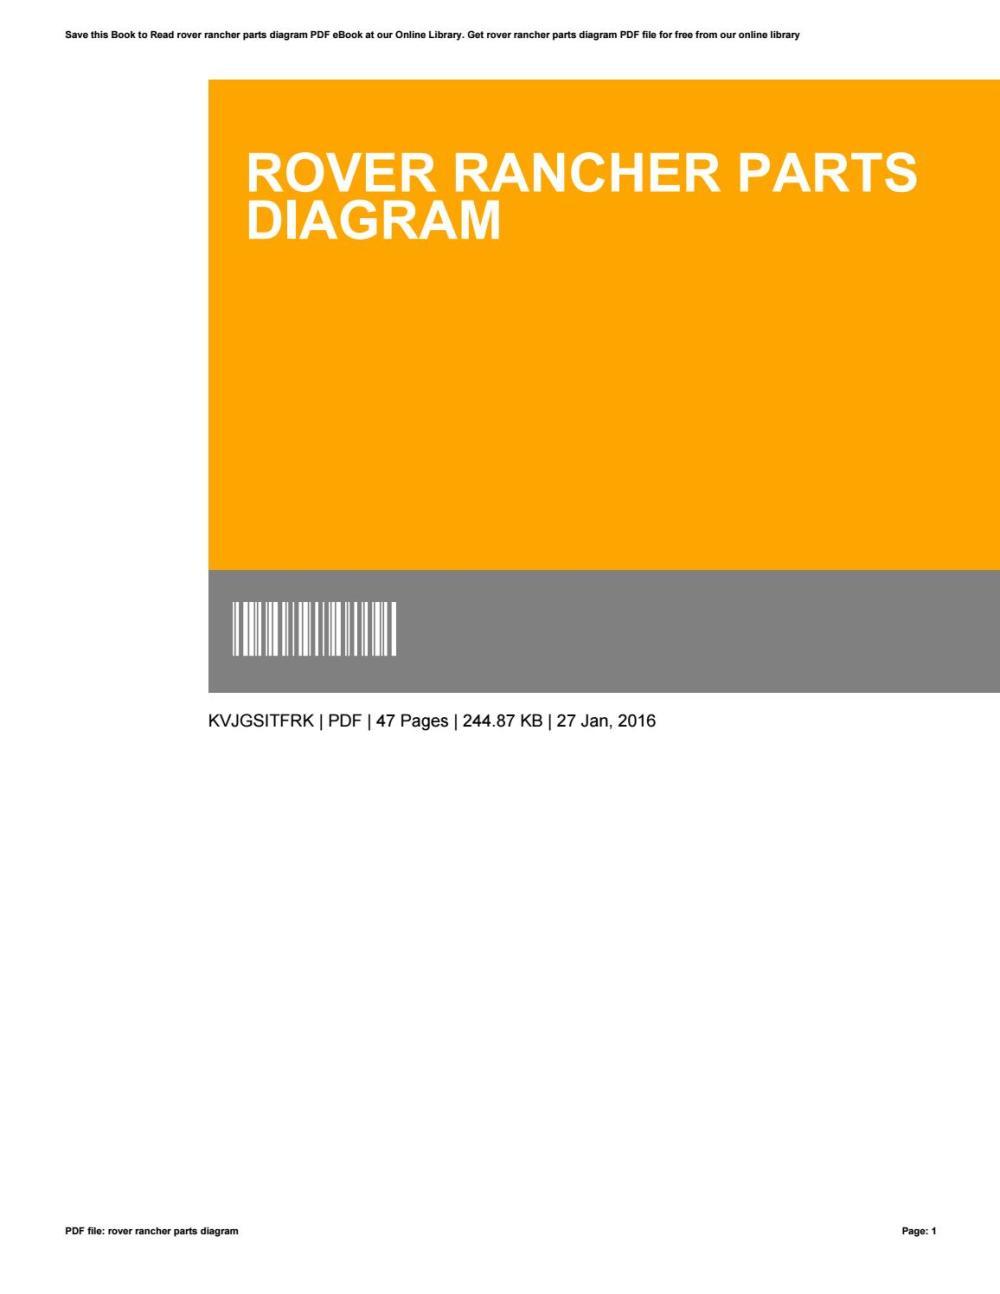 medium resolution of rover rancher wiring diagram